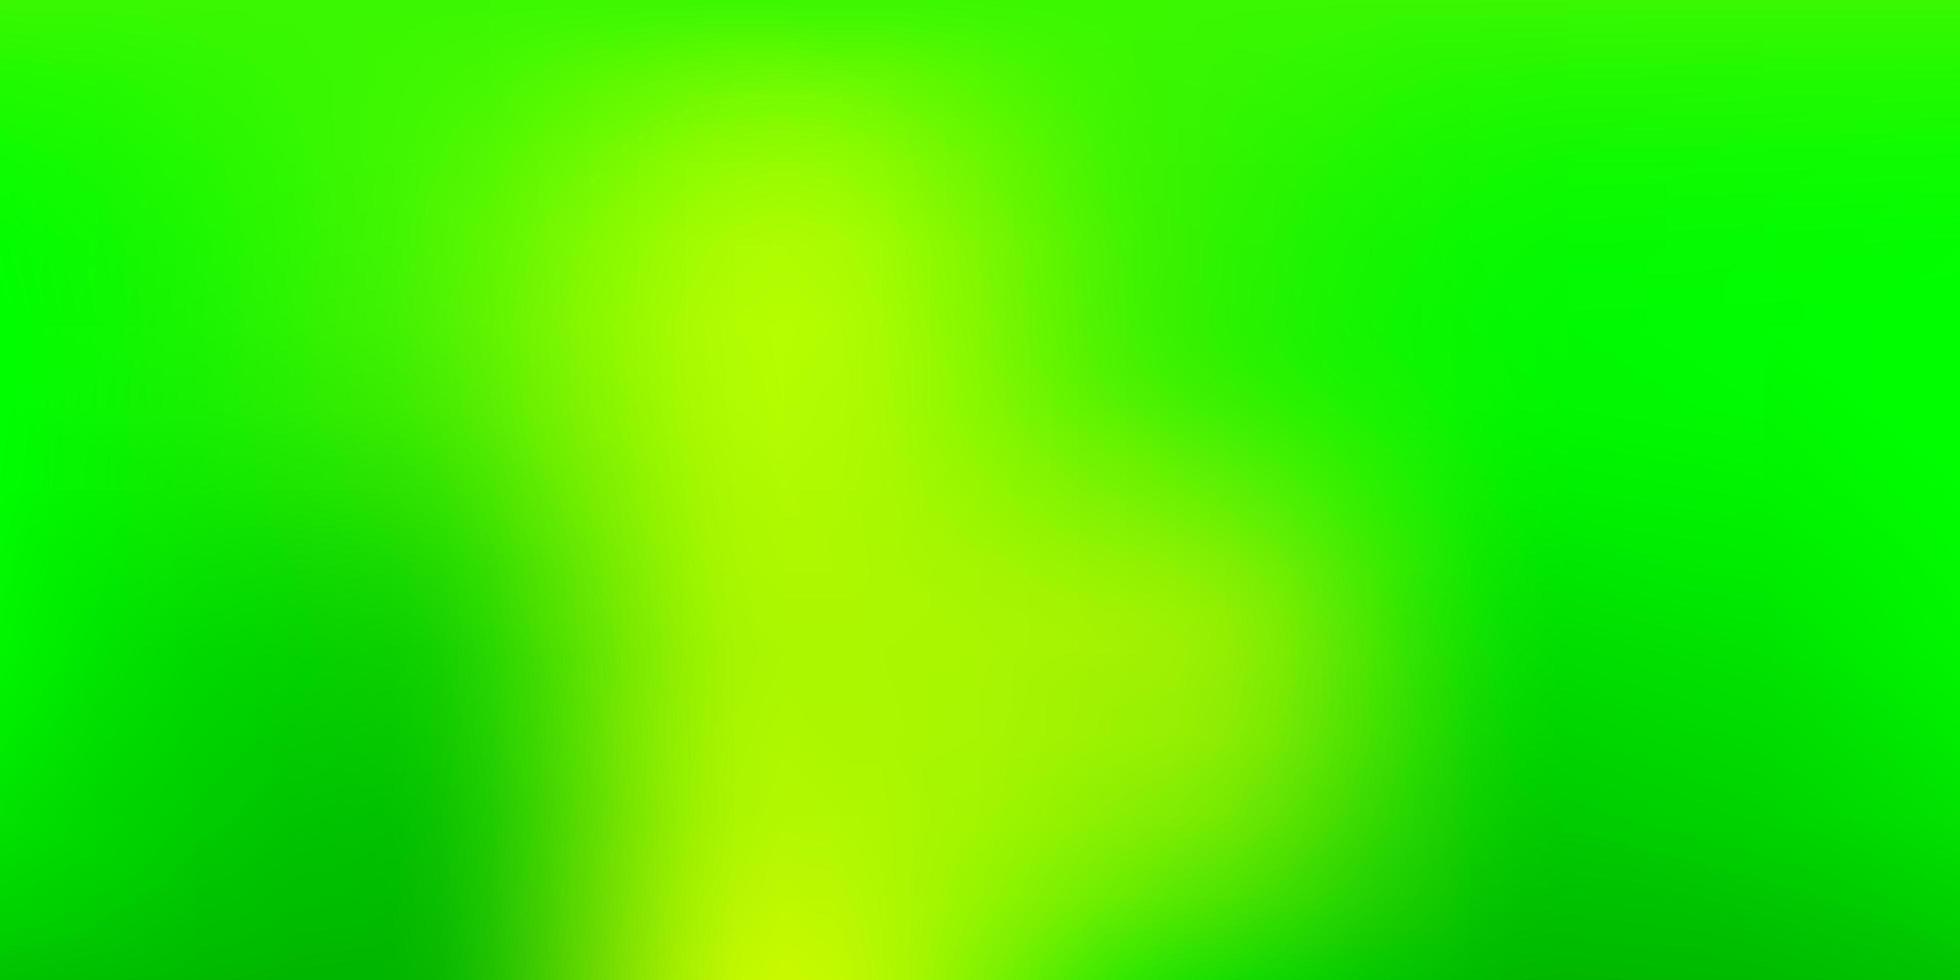 layout turva do vetor verde e amarelo claro.